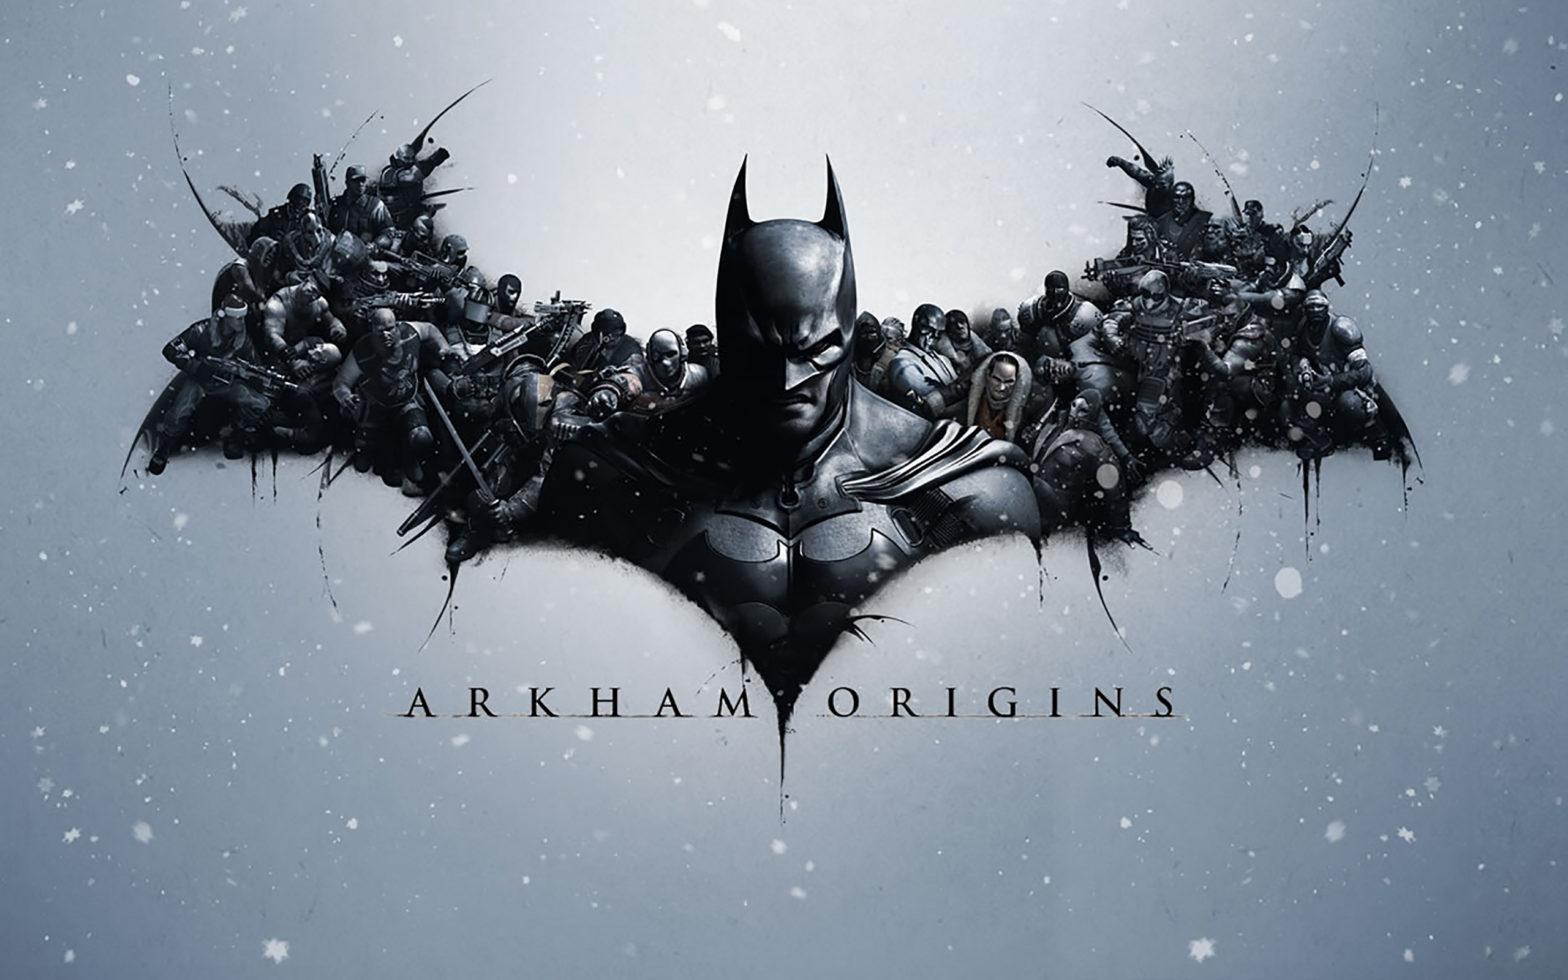 Batman: Arkham Origins Teaser